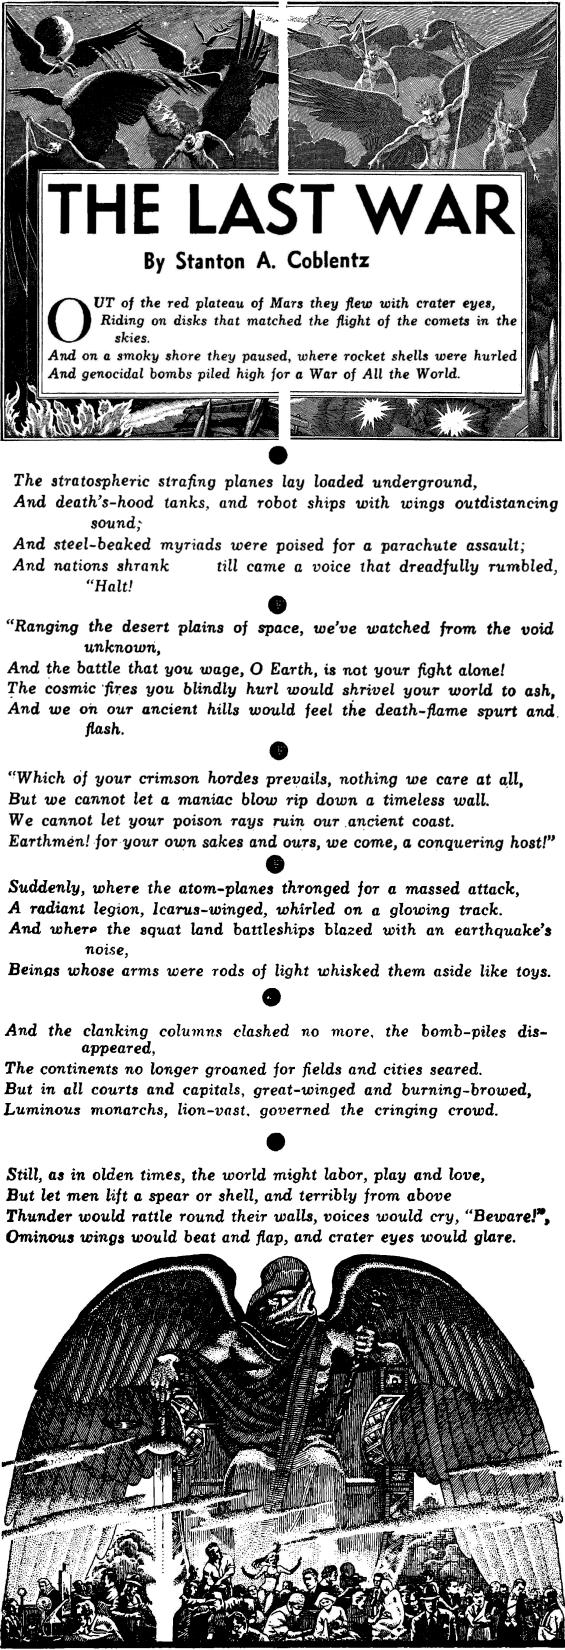 The Last War by Stanton A. Coblentz